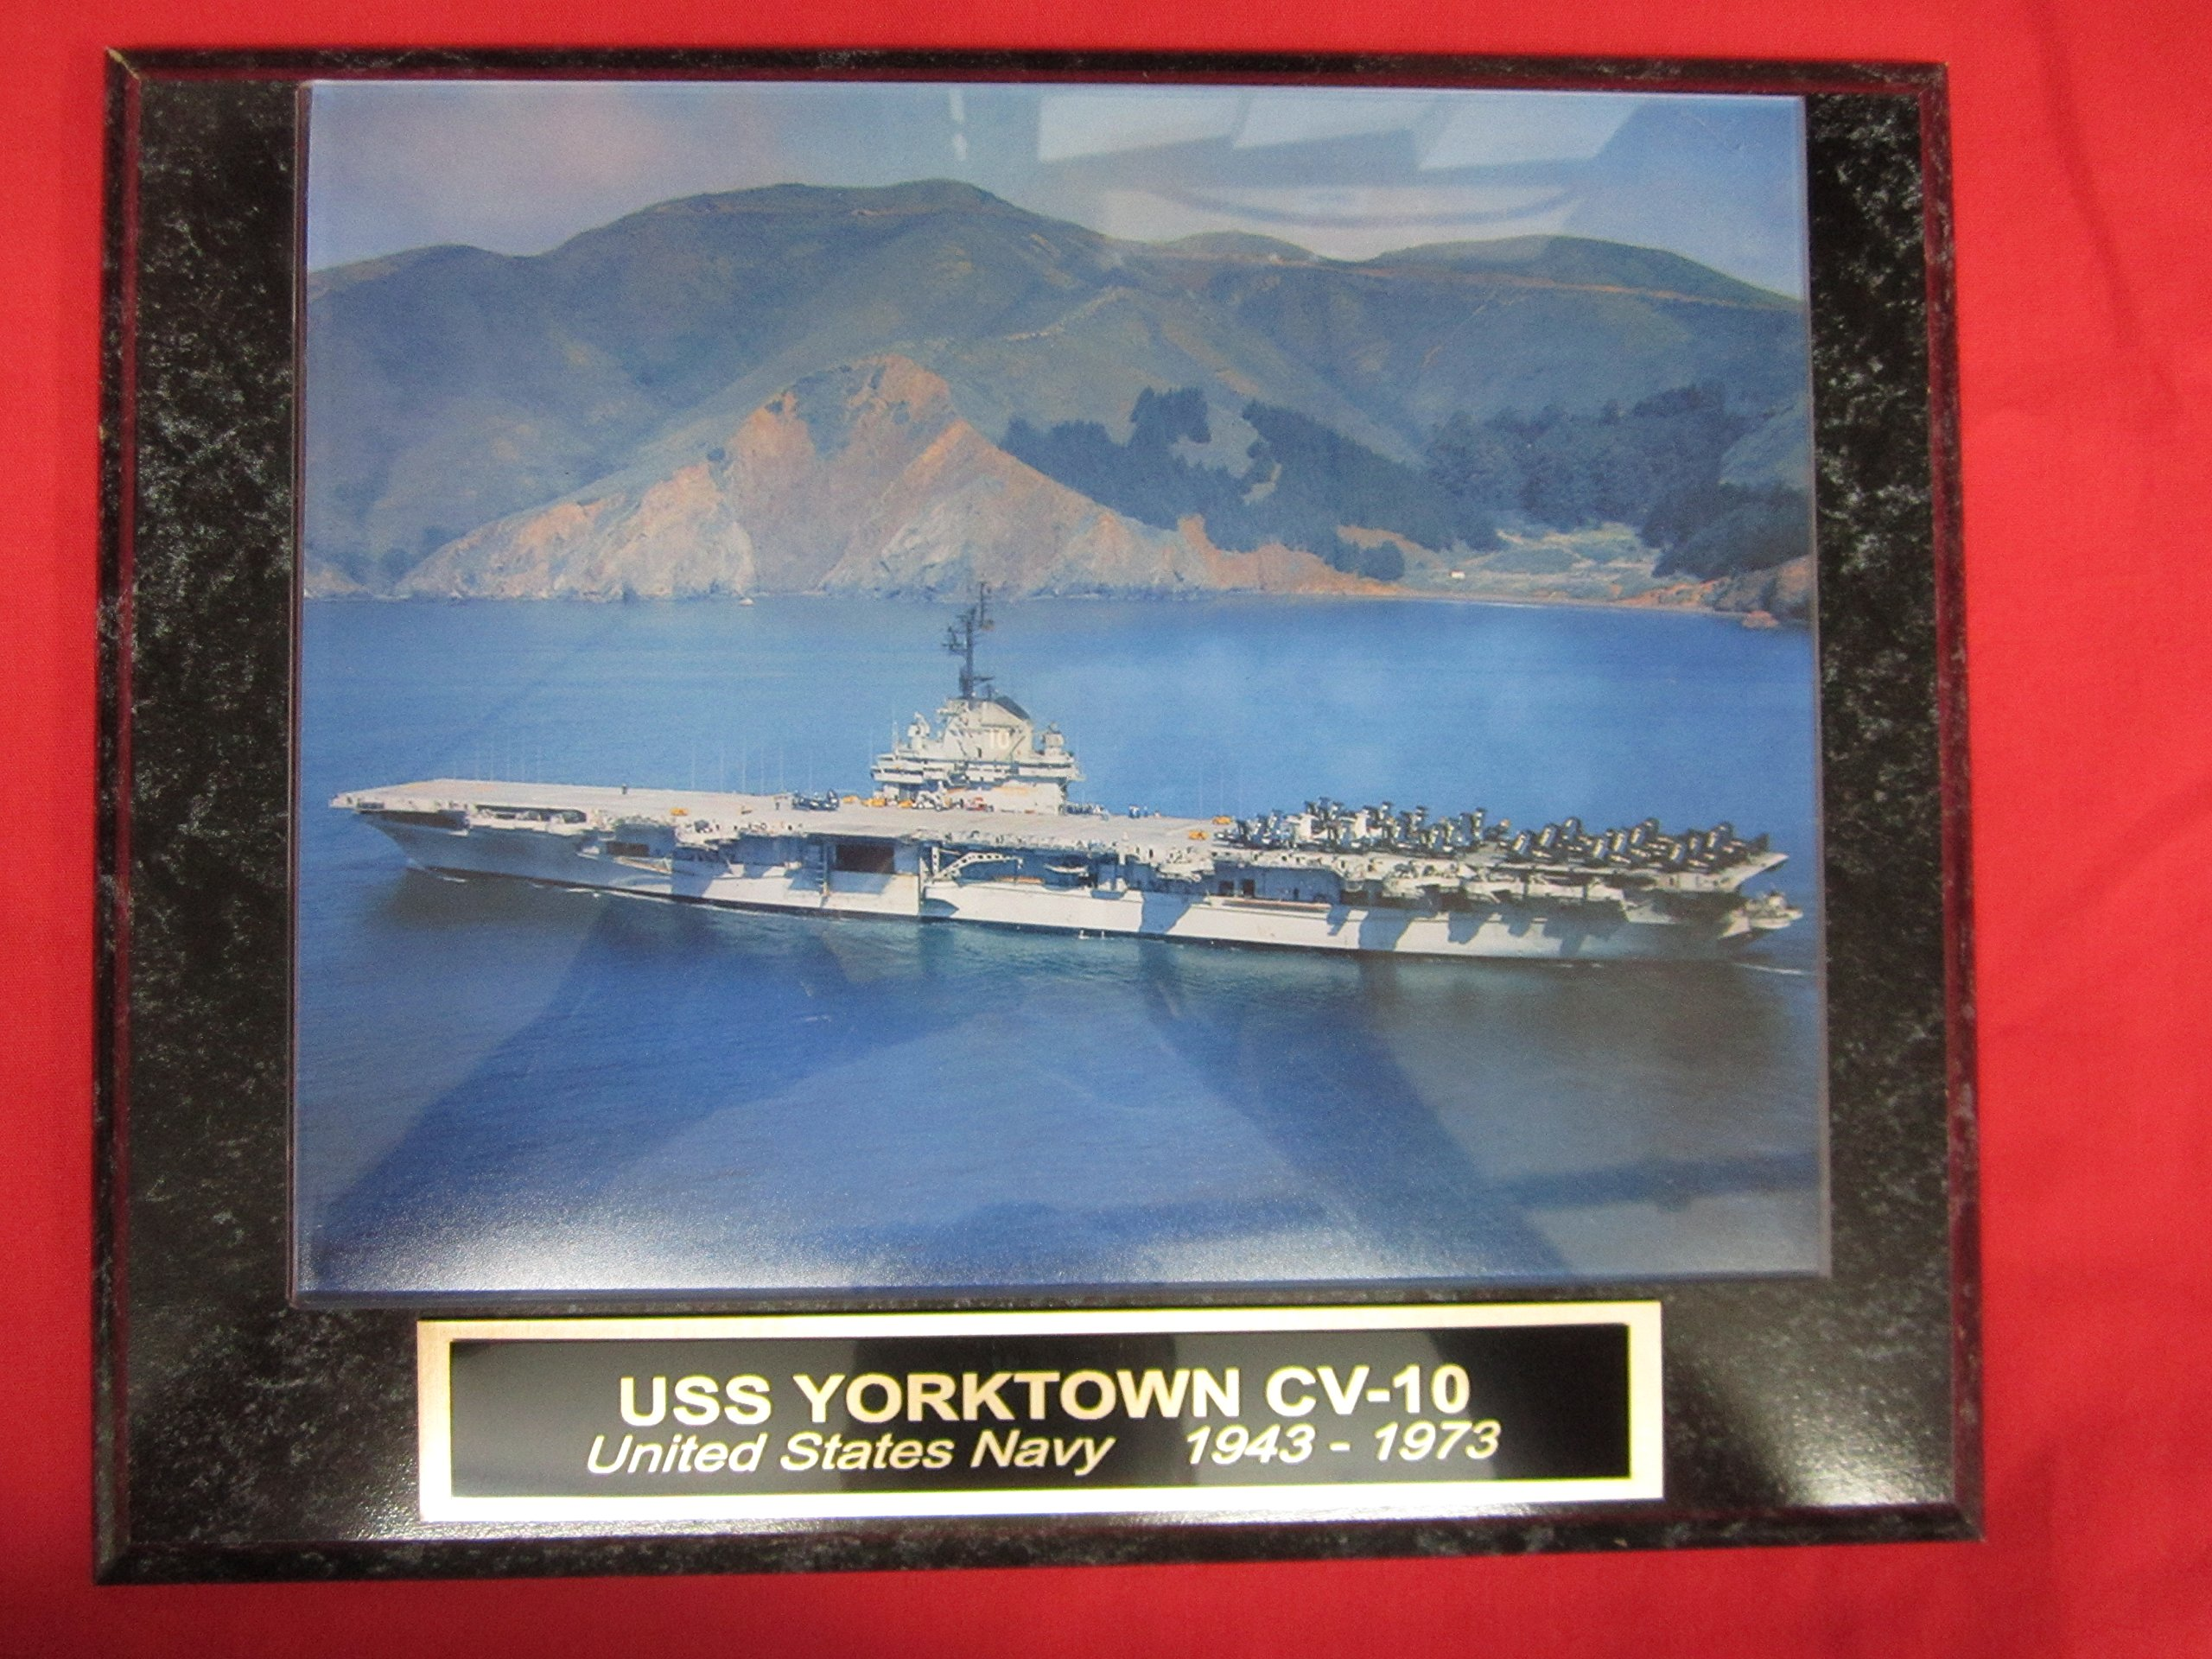 US Navy USS YORKTOWN CV 10 Collector Plaque w/8x10 Photo!